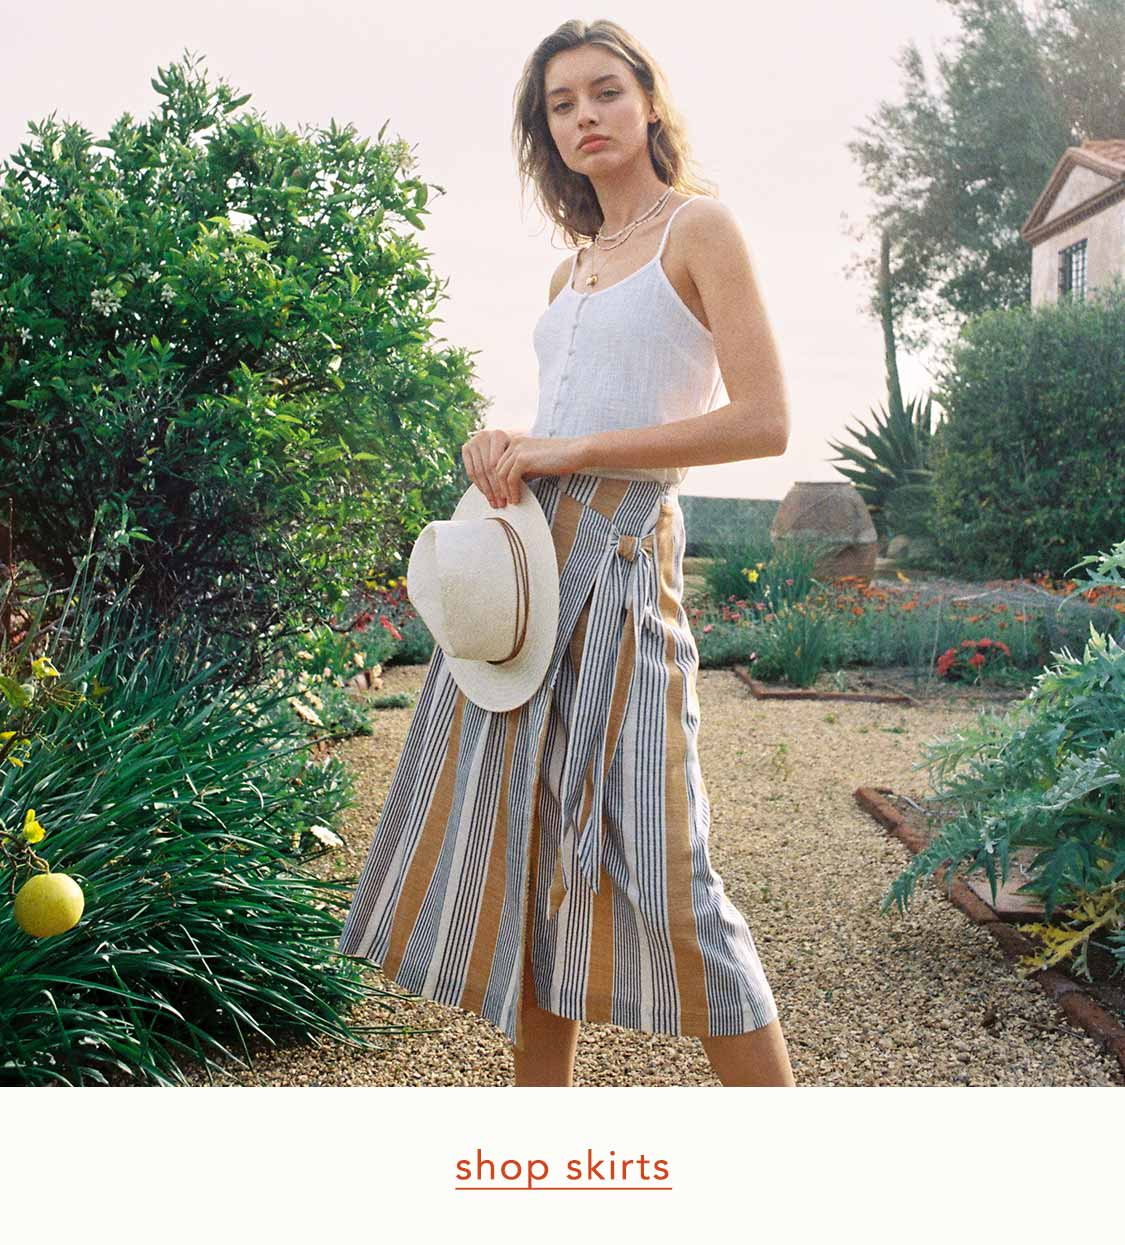 da9677065d67 Anthropologie - Women's Clothing, Accessories & Home